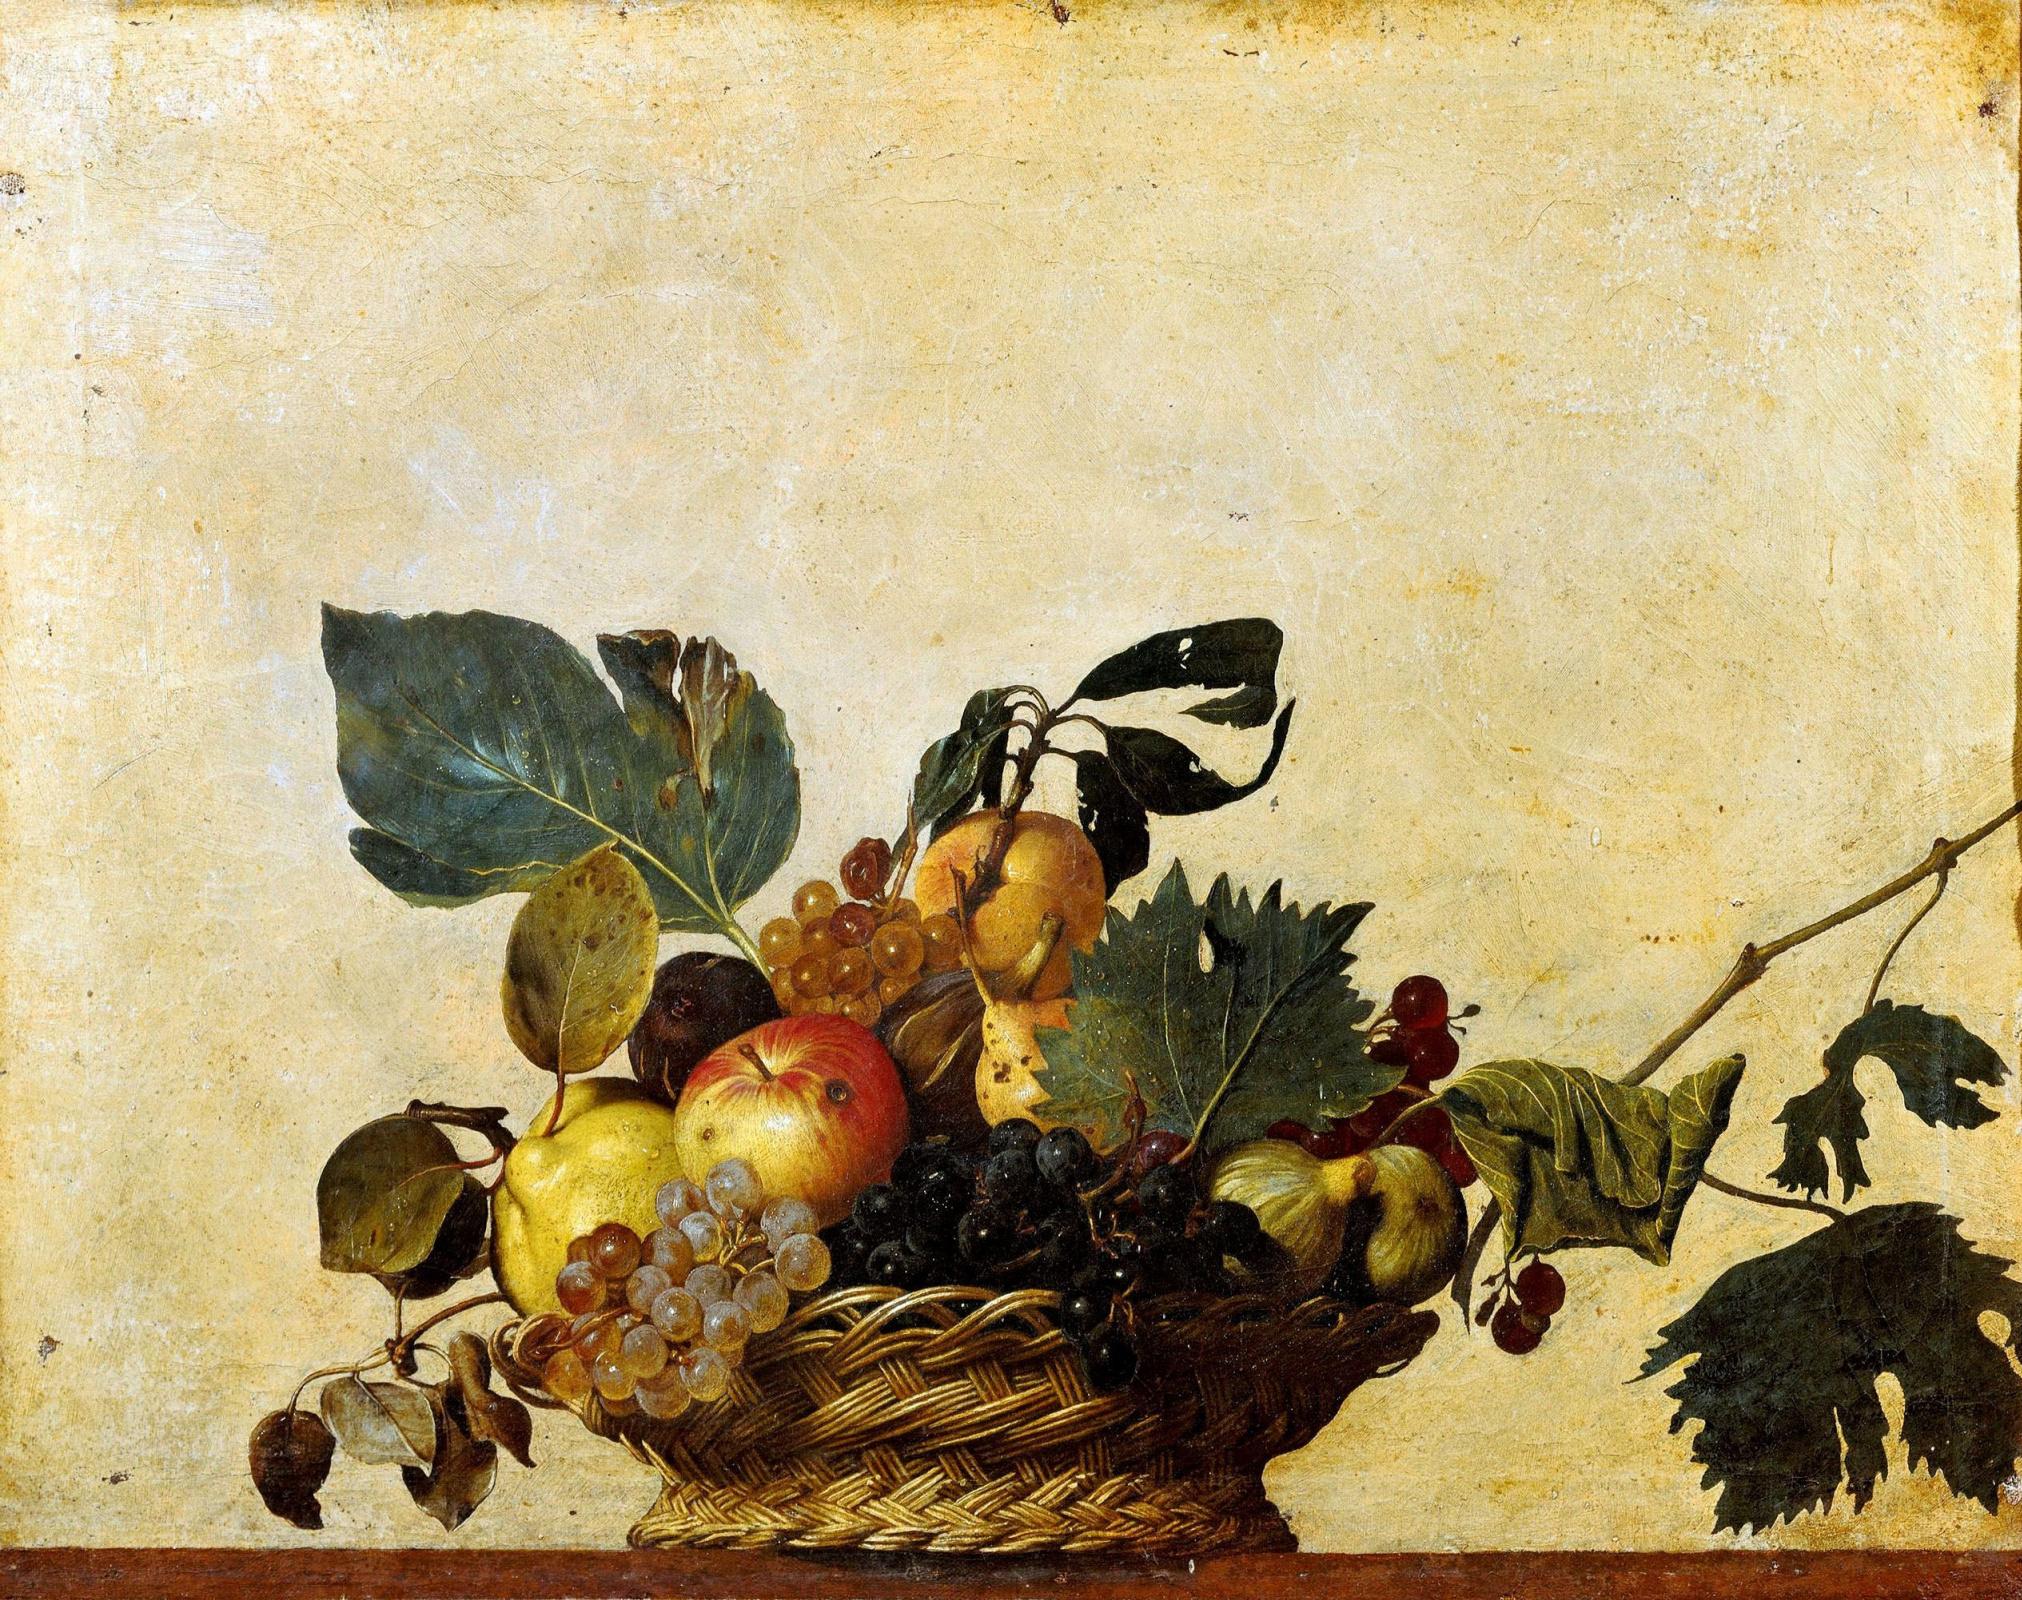 Микеланджело Меризи де Караваджо. Корзина с фруктами